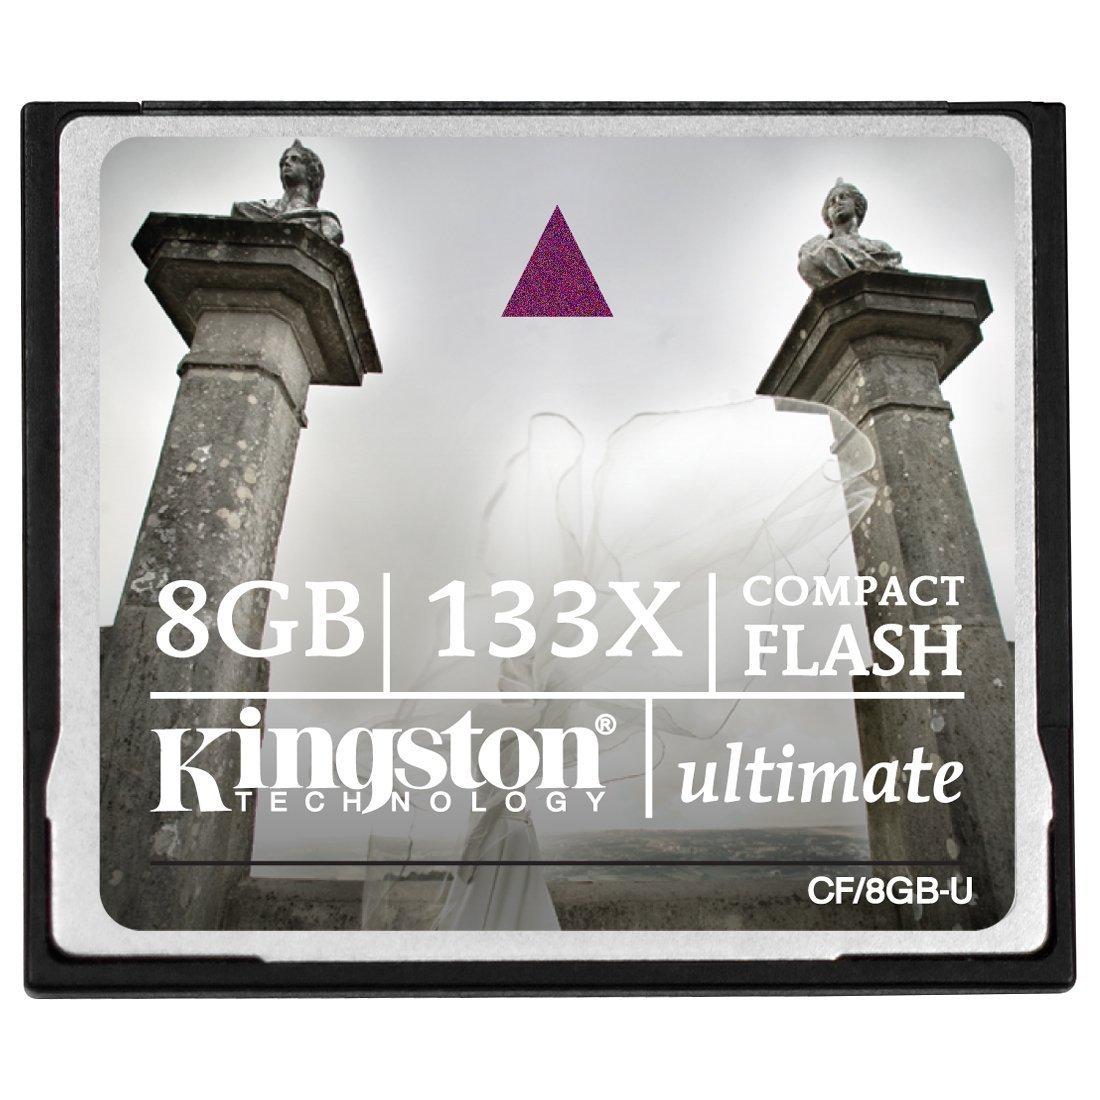 Kingston Ultimate 8 GB 133x CompactFlash Memory Card CF/8GB-U